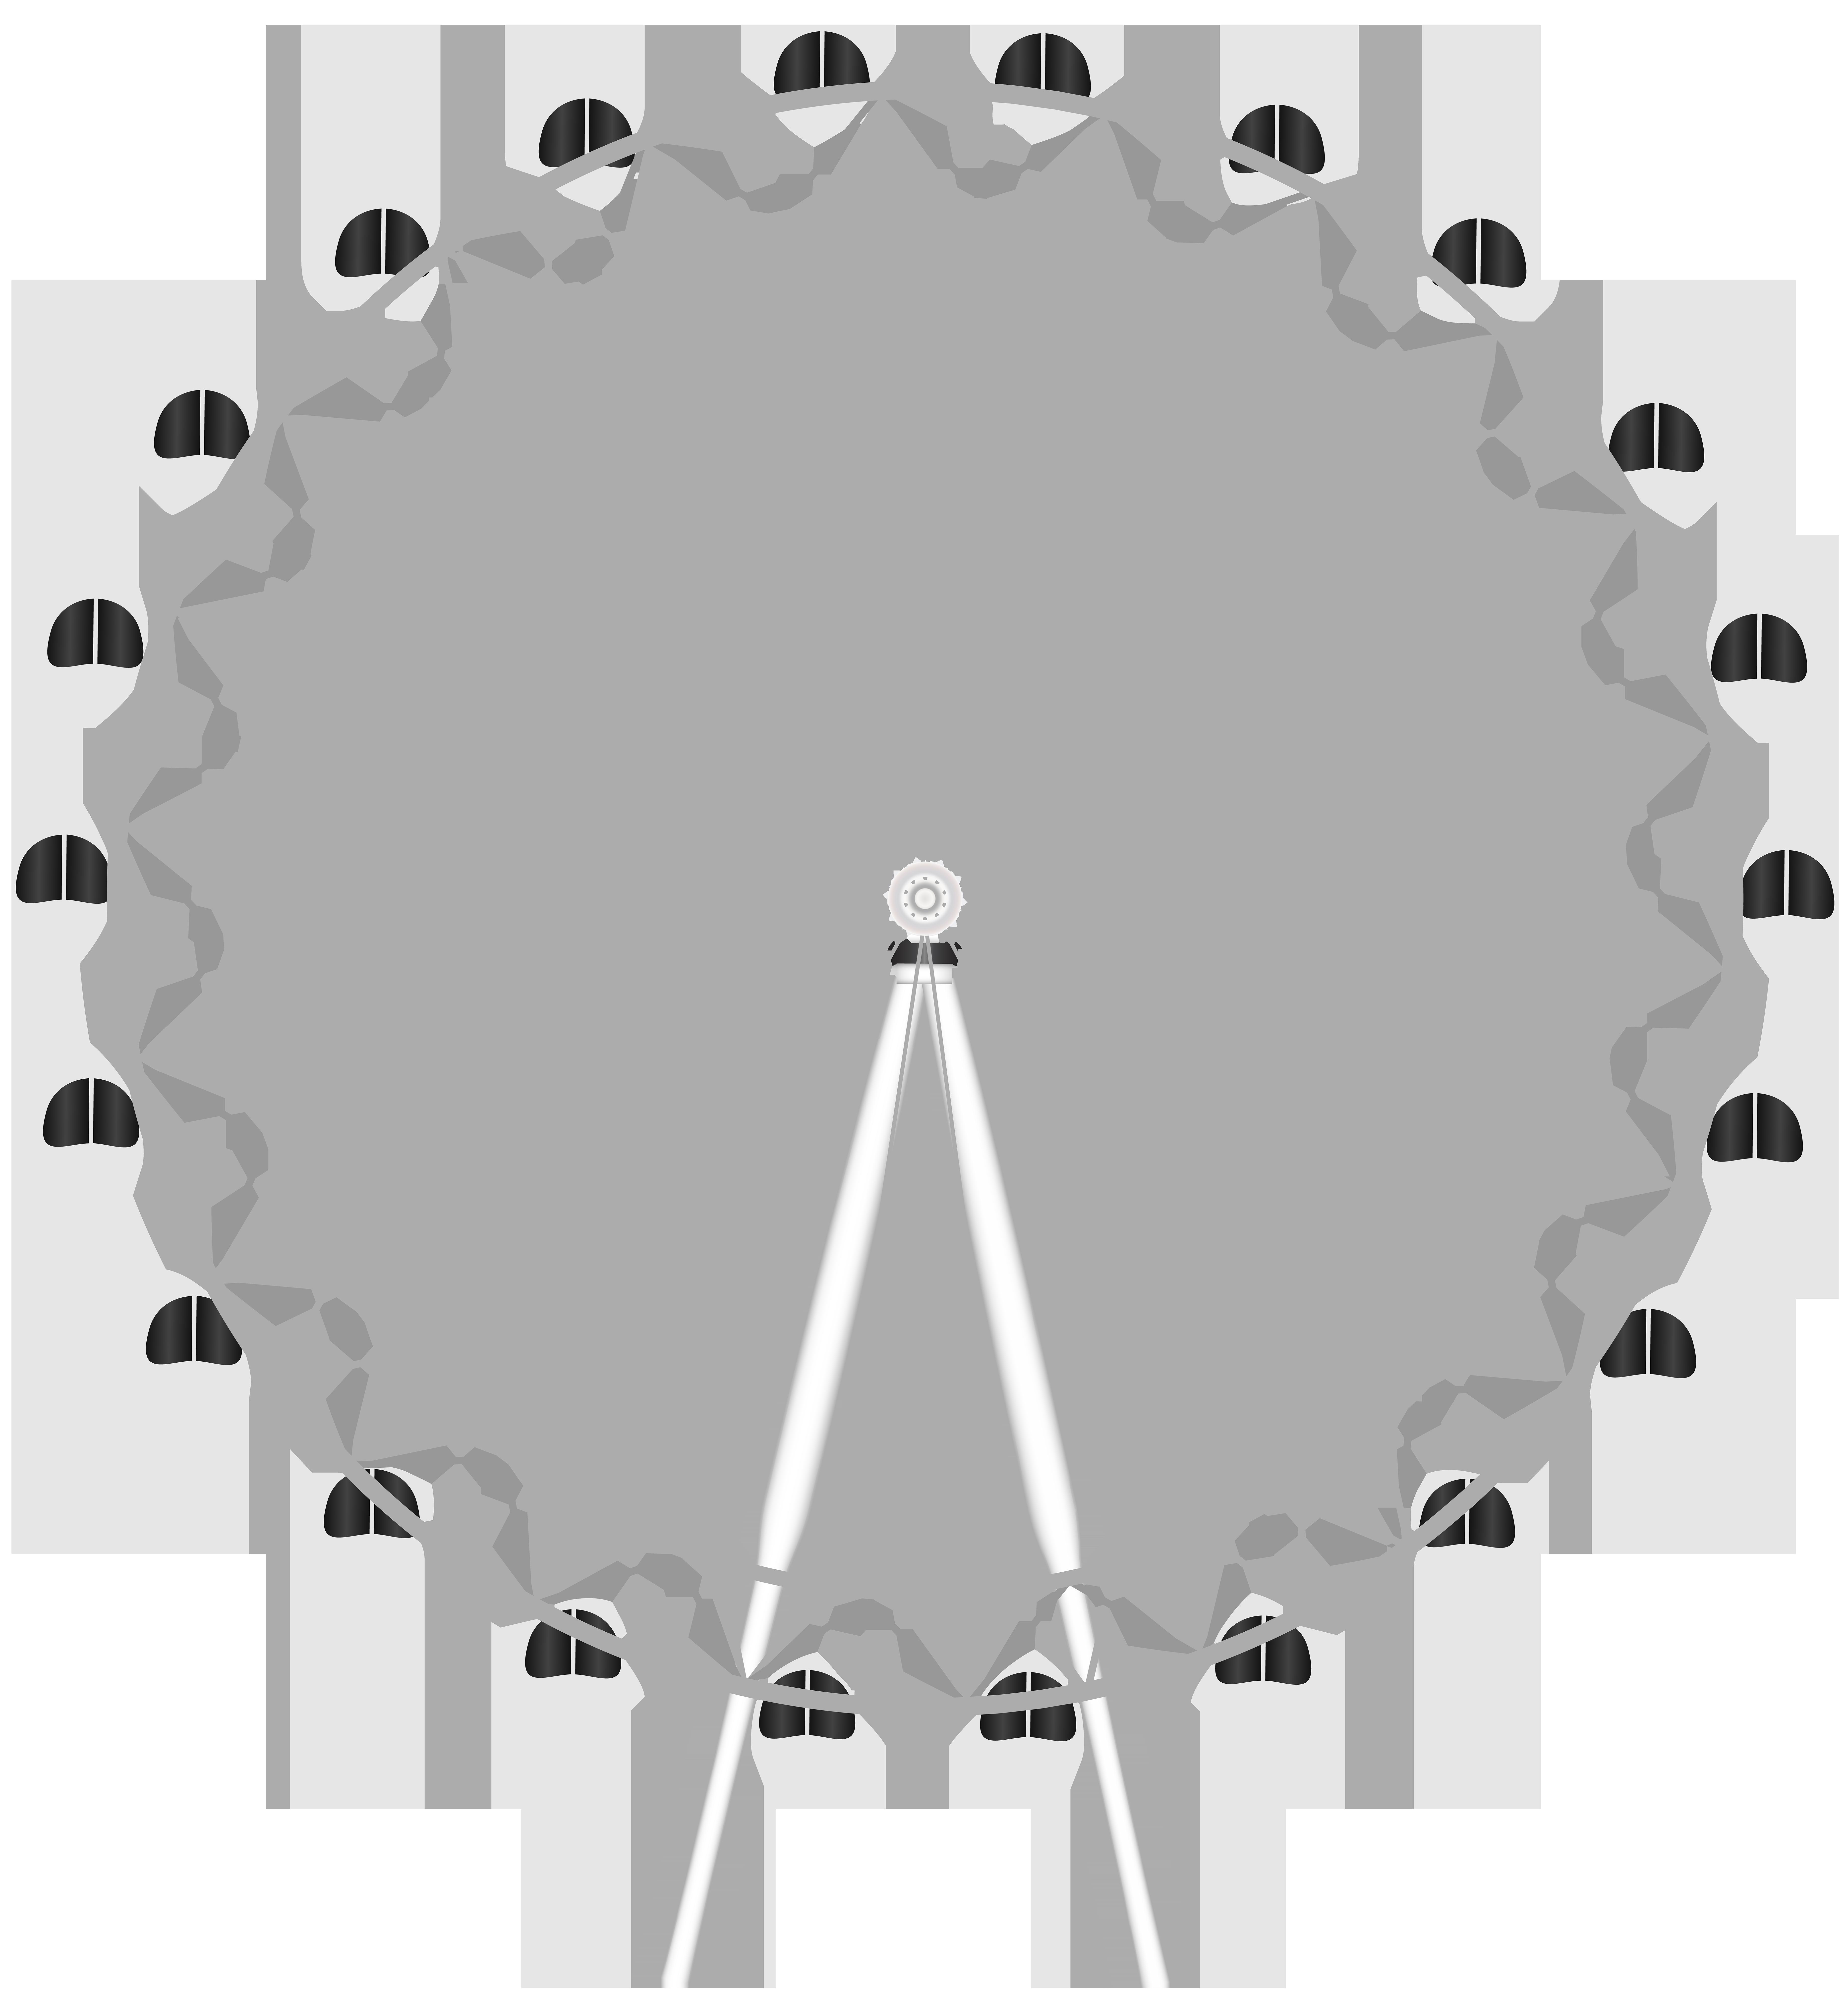 London clipart ferris wheel london. Eye stock photography png